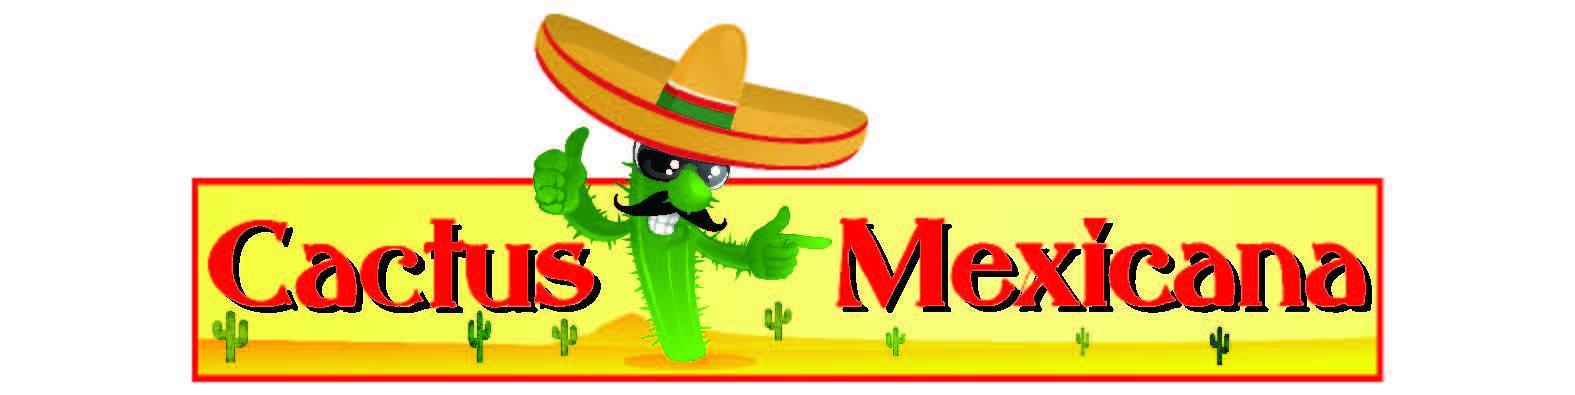 Cactus Mexicana